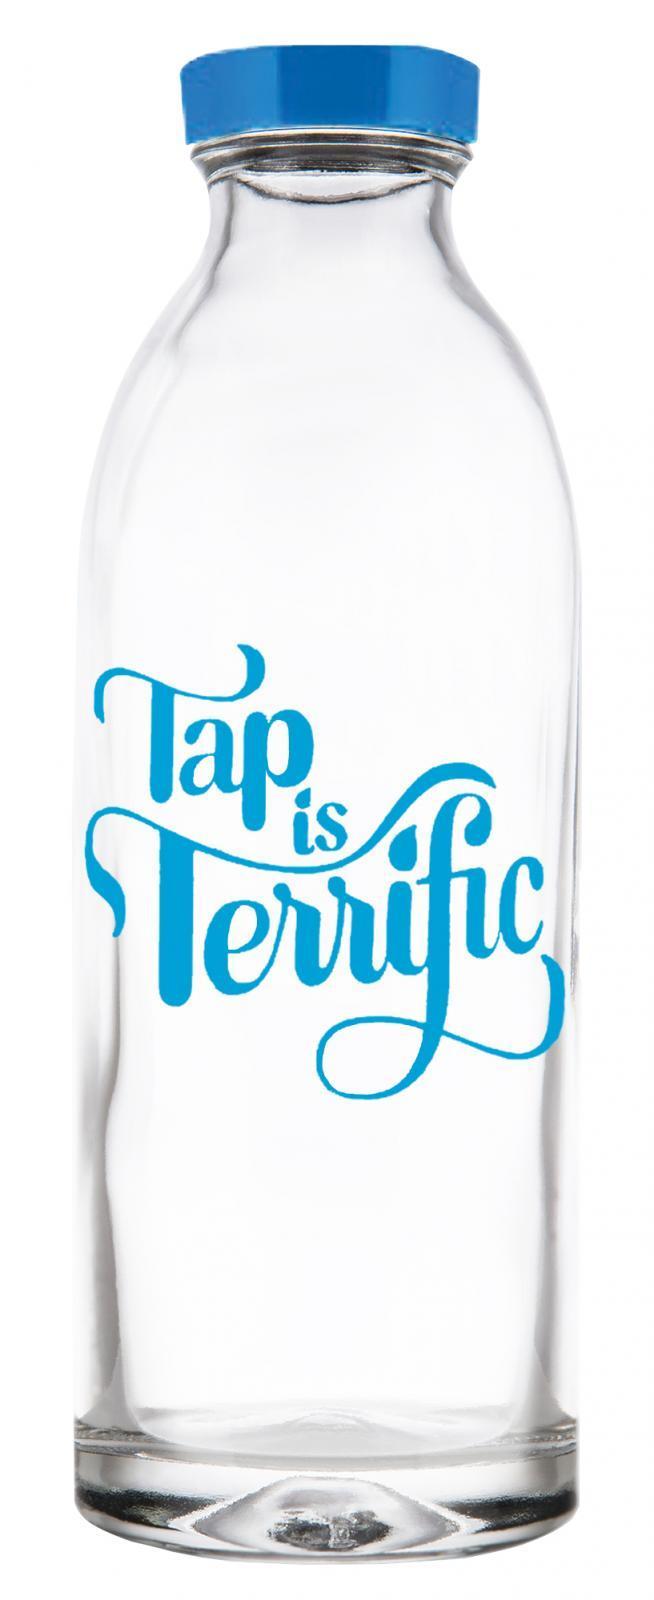 Tap Is Terrific Reusable Glass Water Bottle By Faucet Face, 14.4 oz